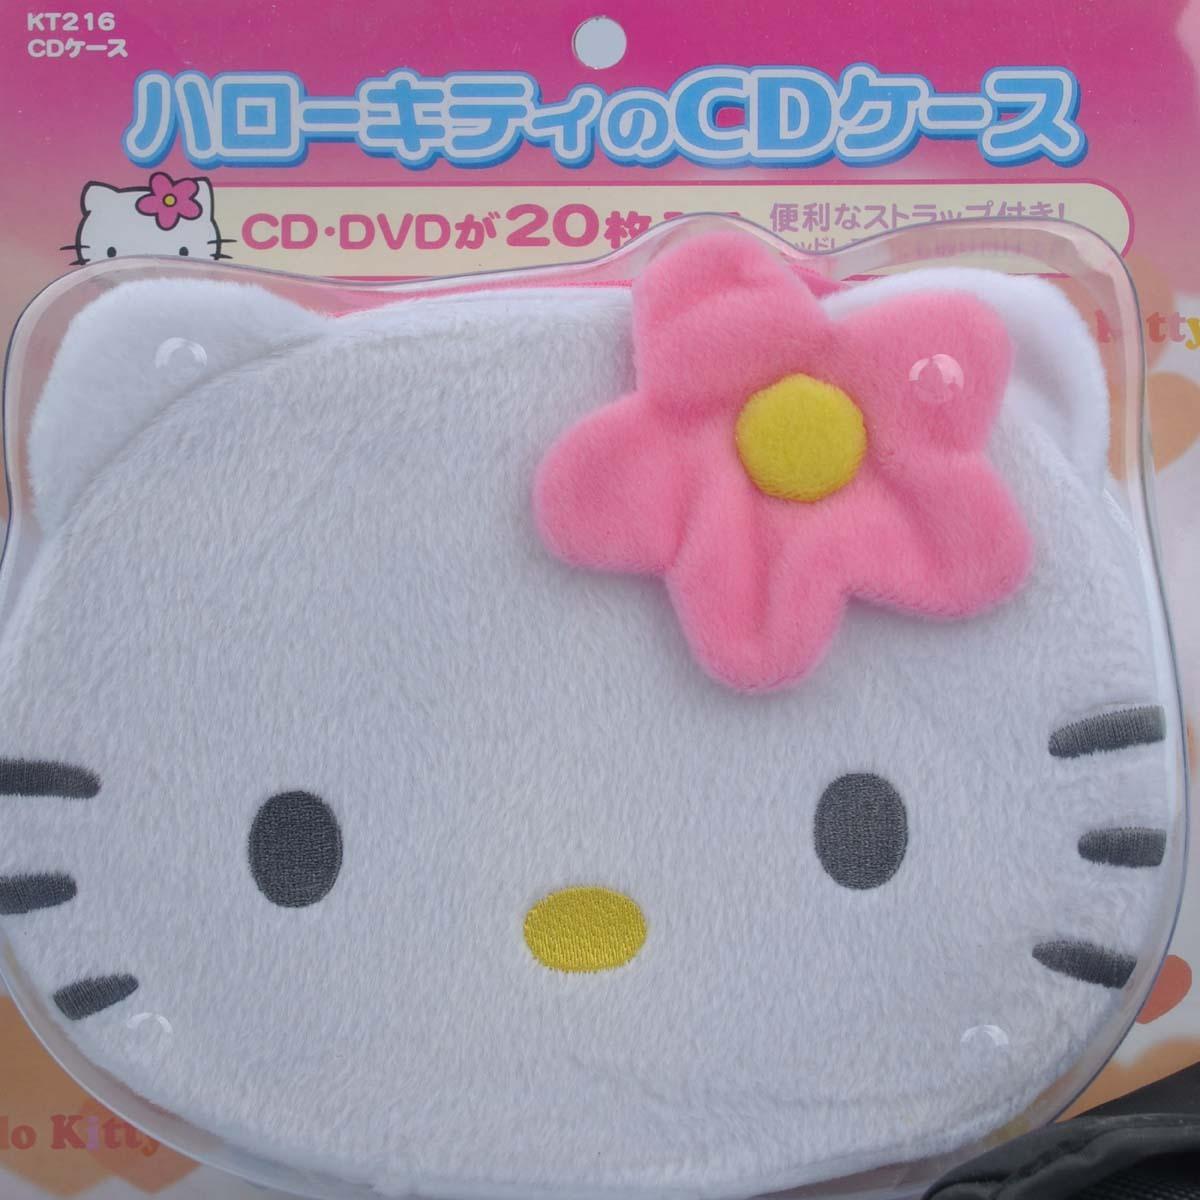 кейс для CD Seiwa  Hello Kitty CD -KT216 песни для вовы 308 cd